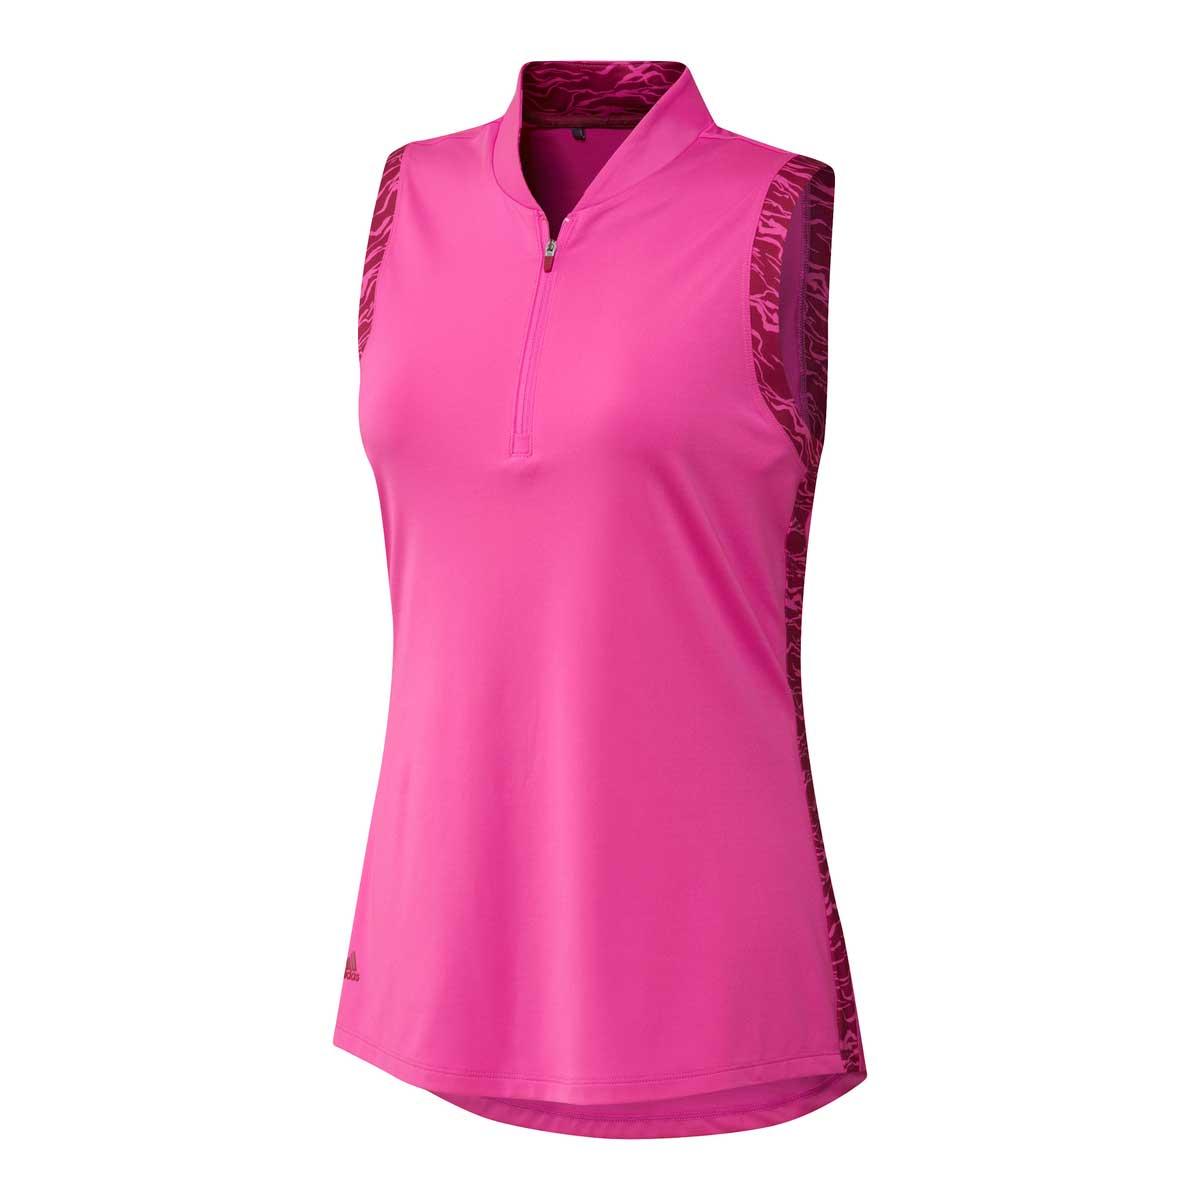 Adidas Women's Ultimate 365 Printed Screaming Pink Sleeveless Polo